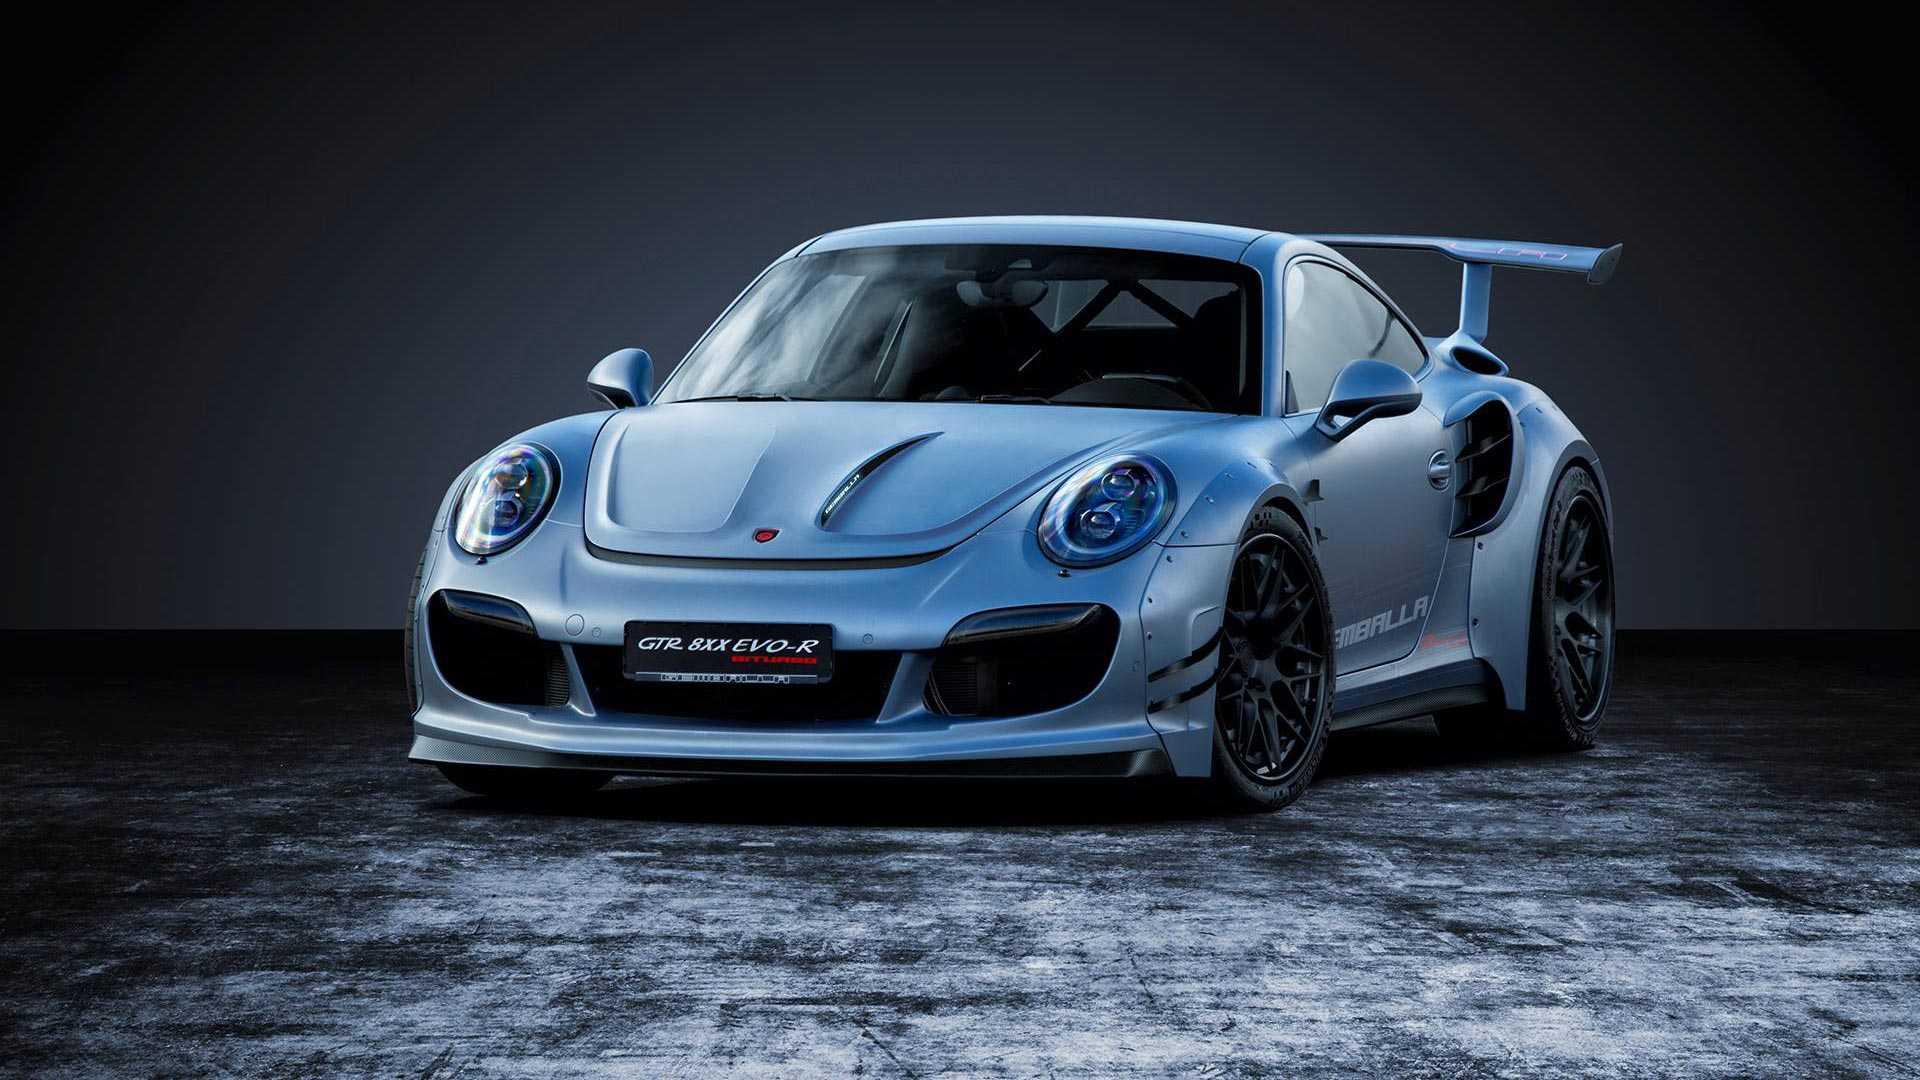 Porsche_911_Turbo_Gemballa-GTR_8XX_Evo-R_0007